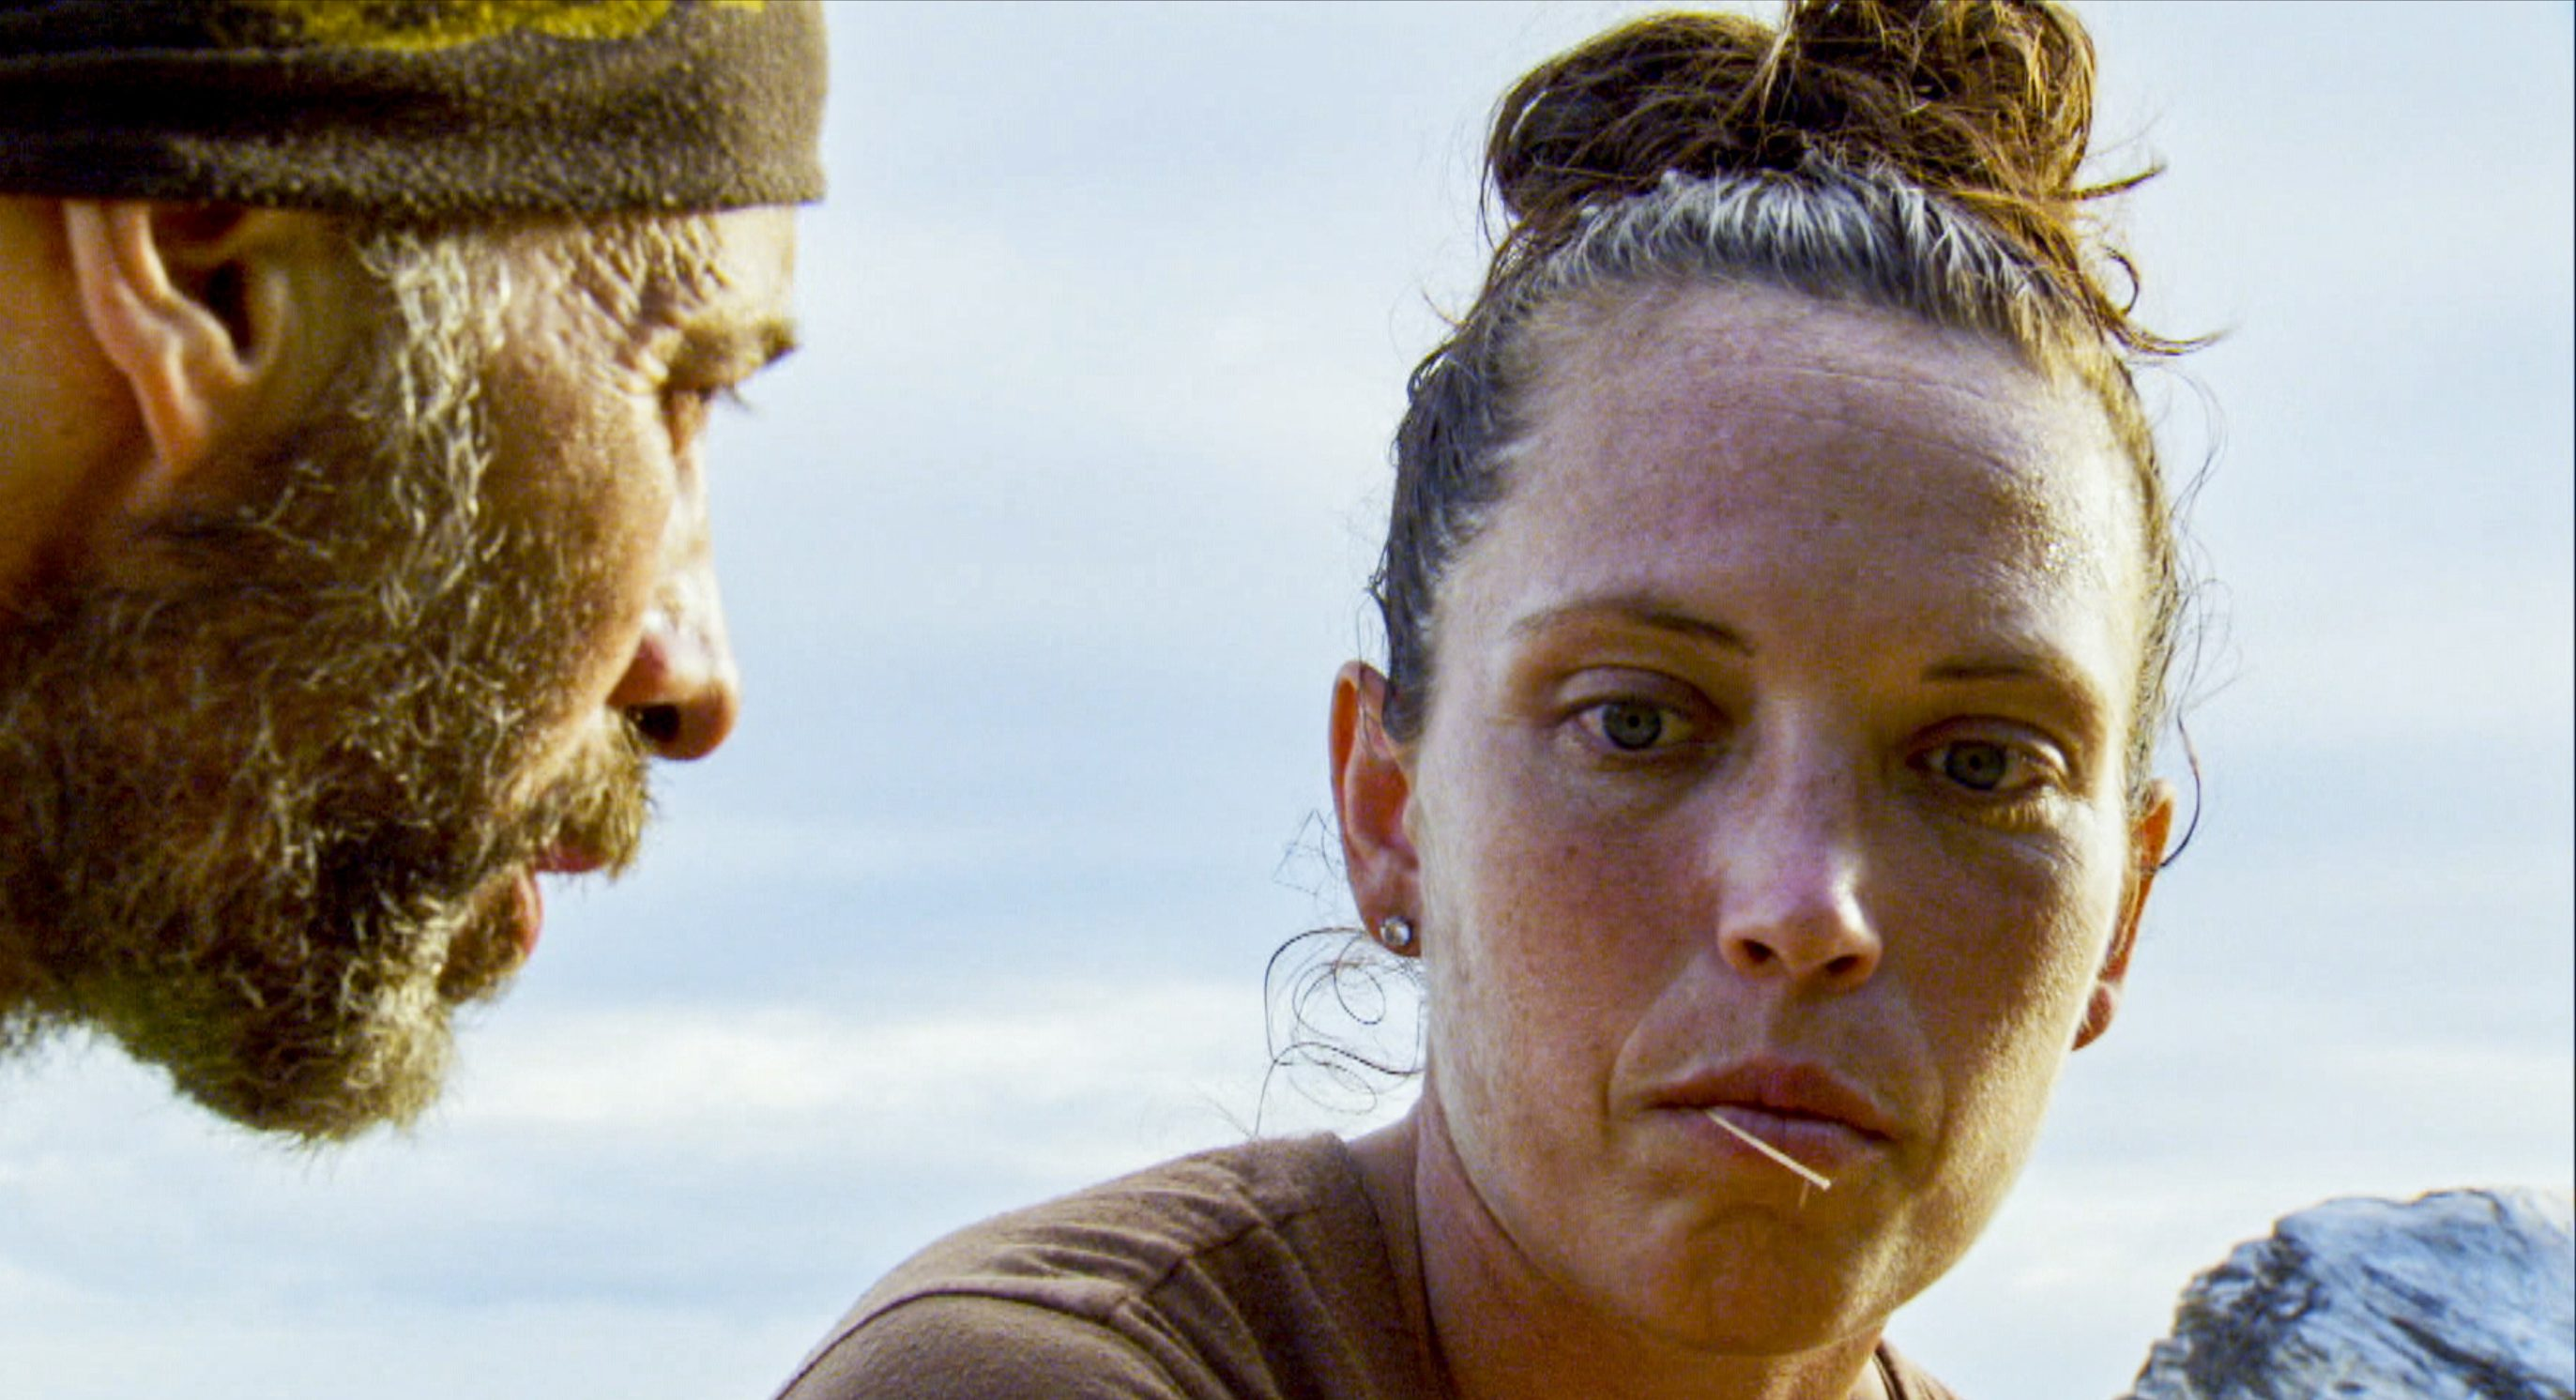 survivor season 41 cast info spoilers so far heavy